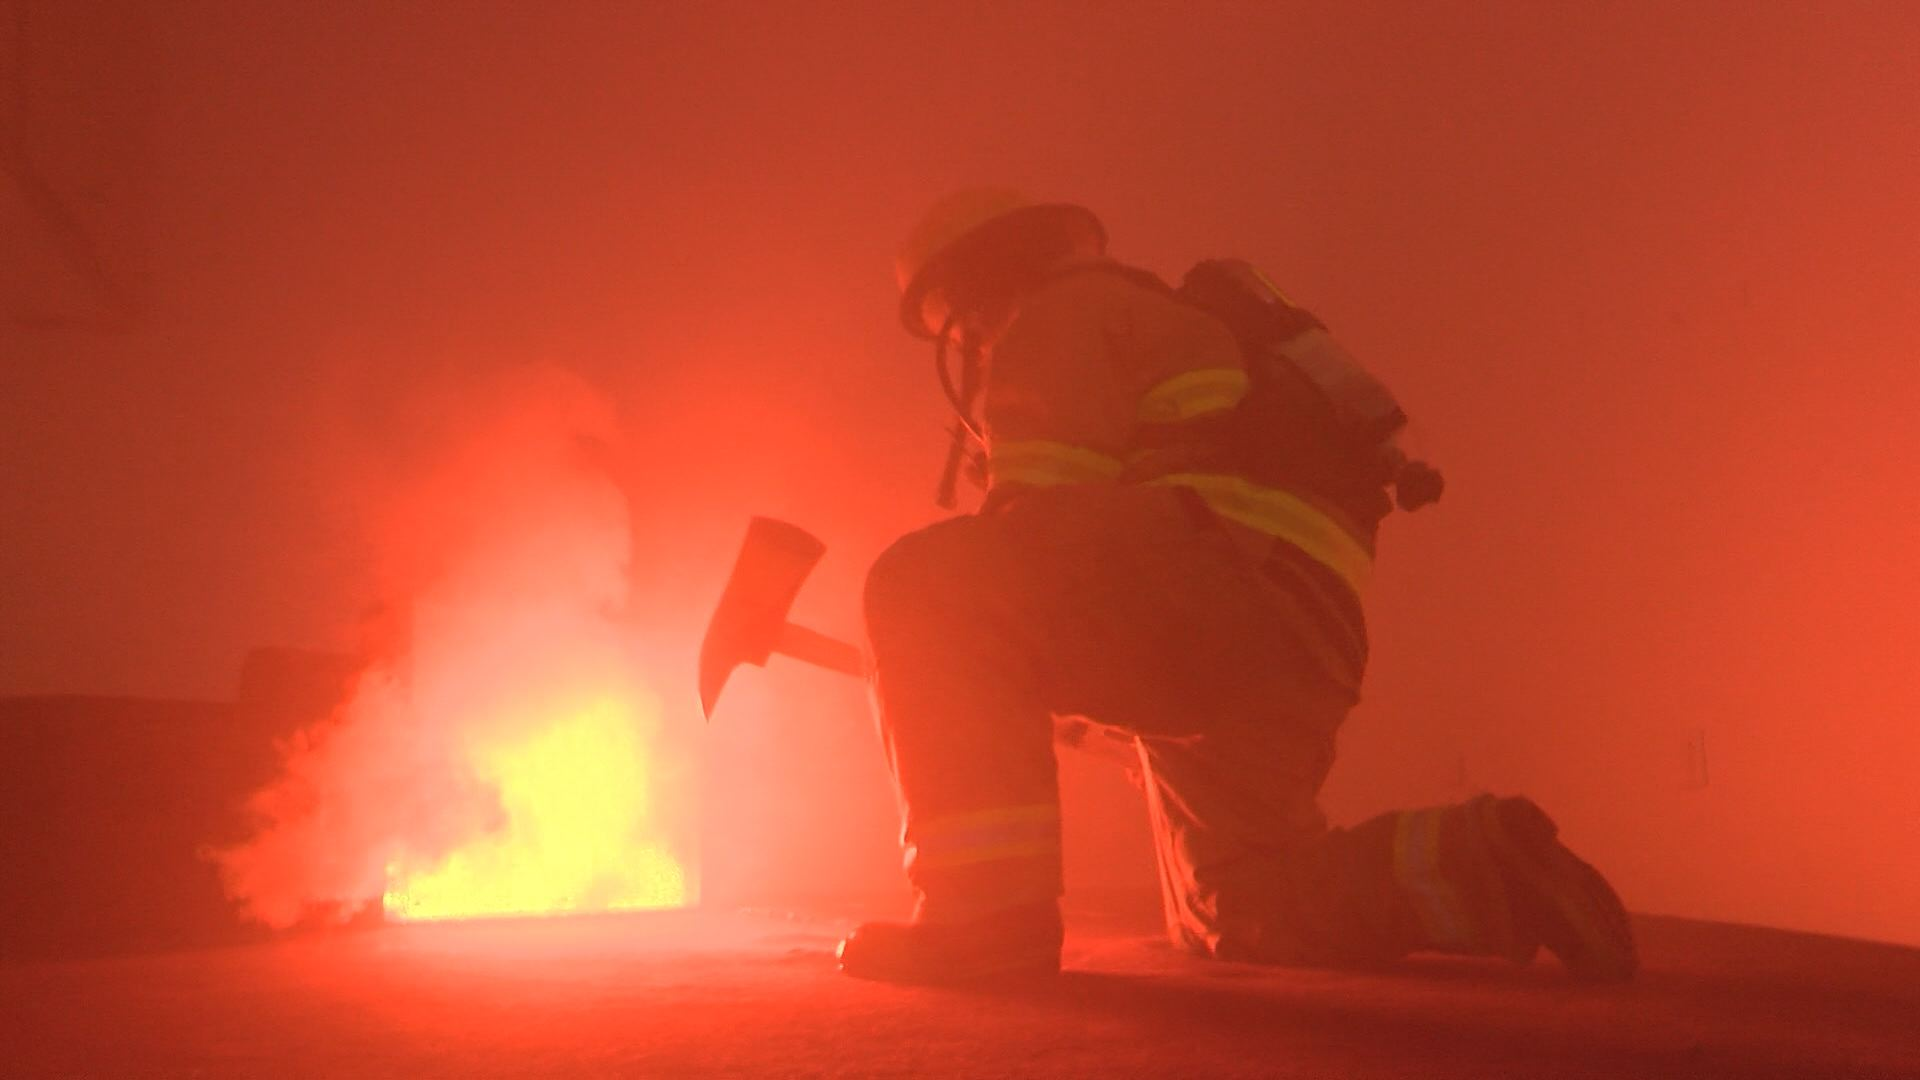 fire training_261386